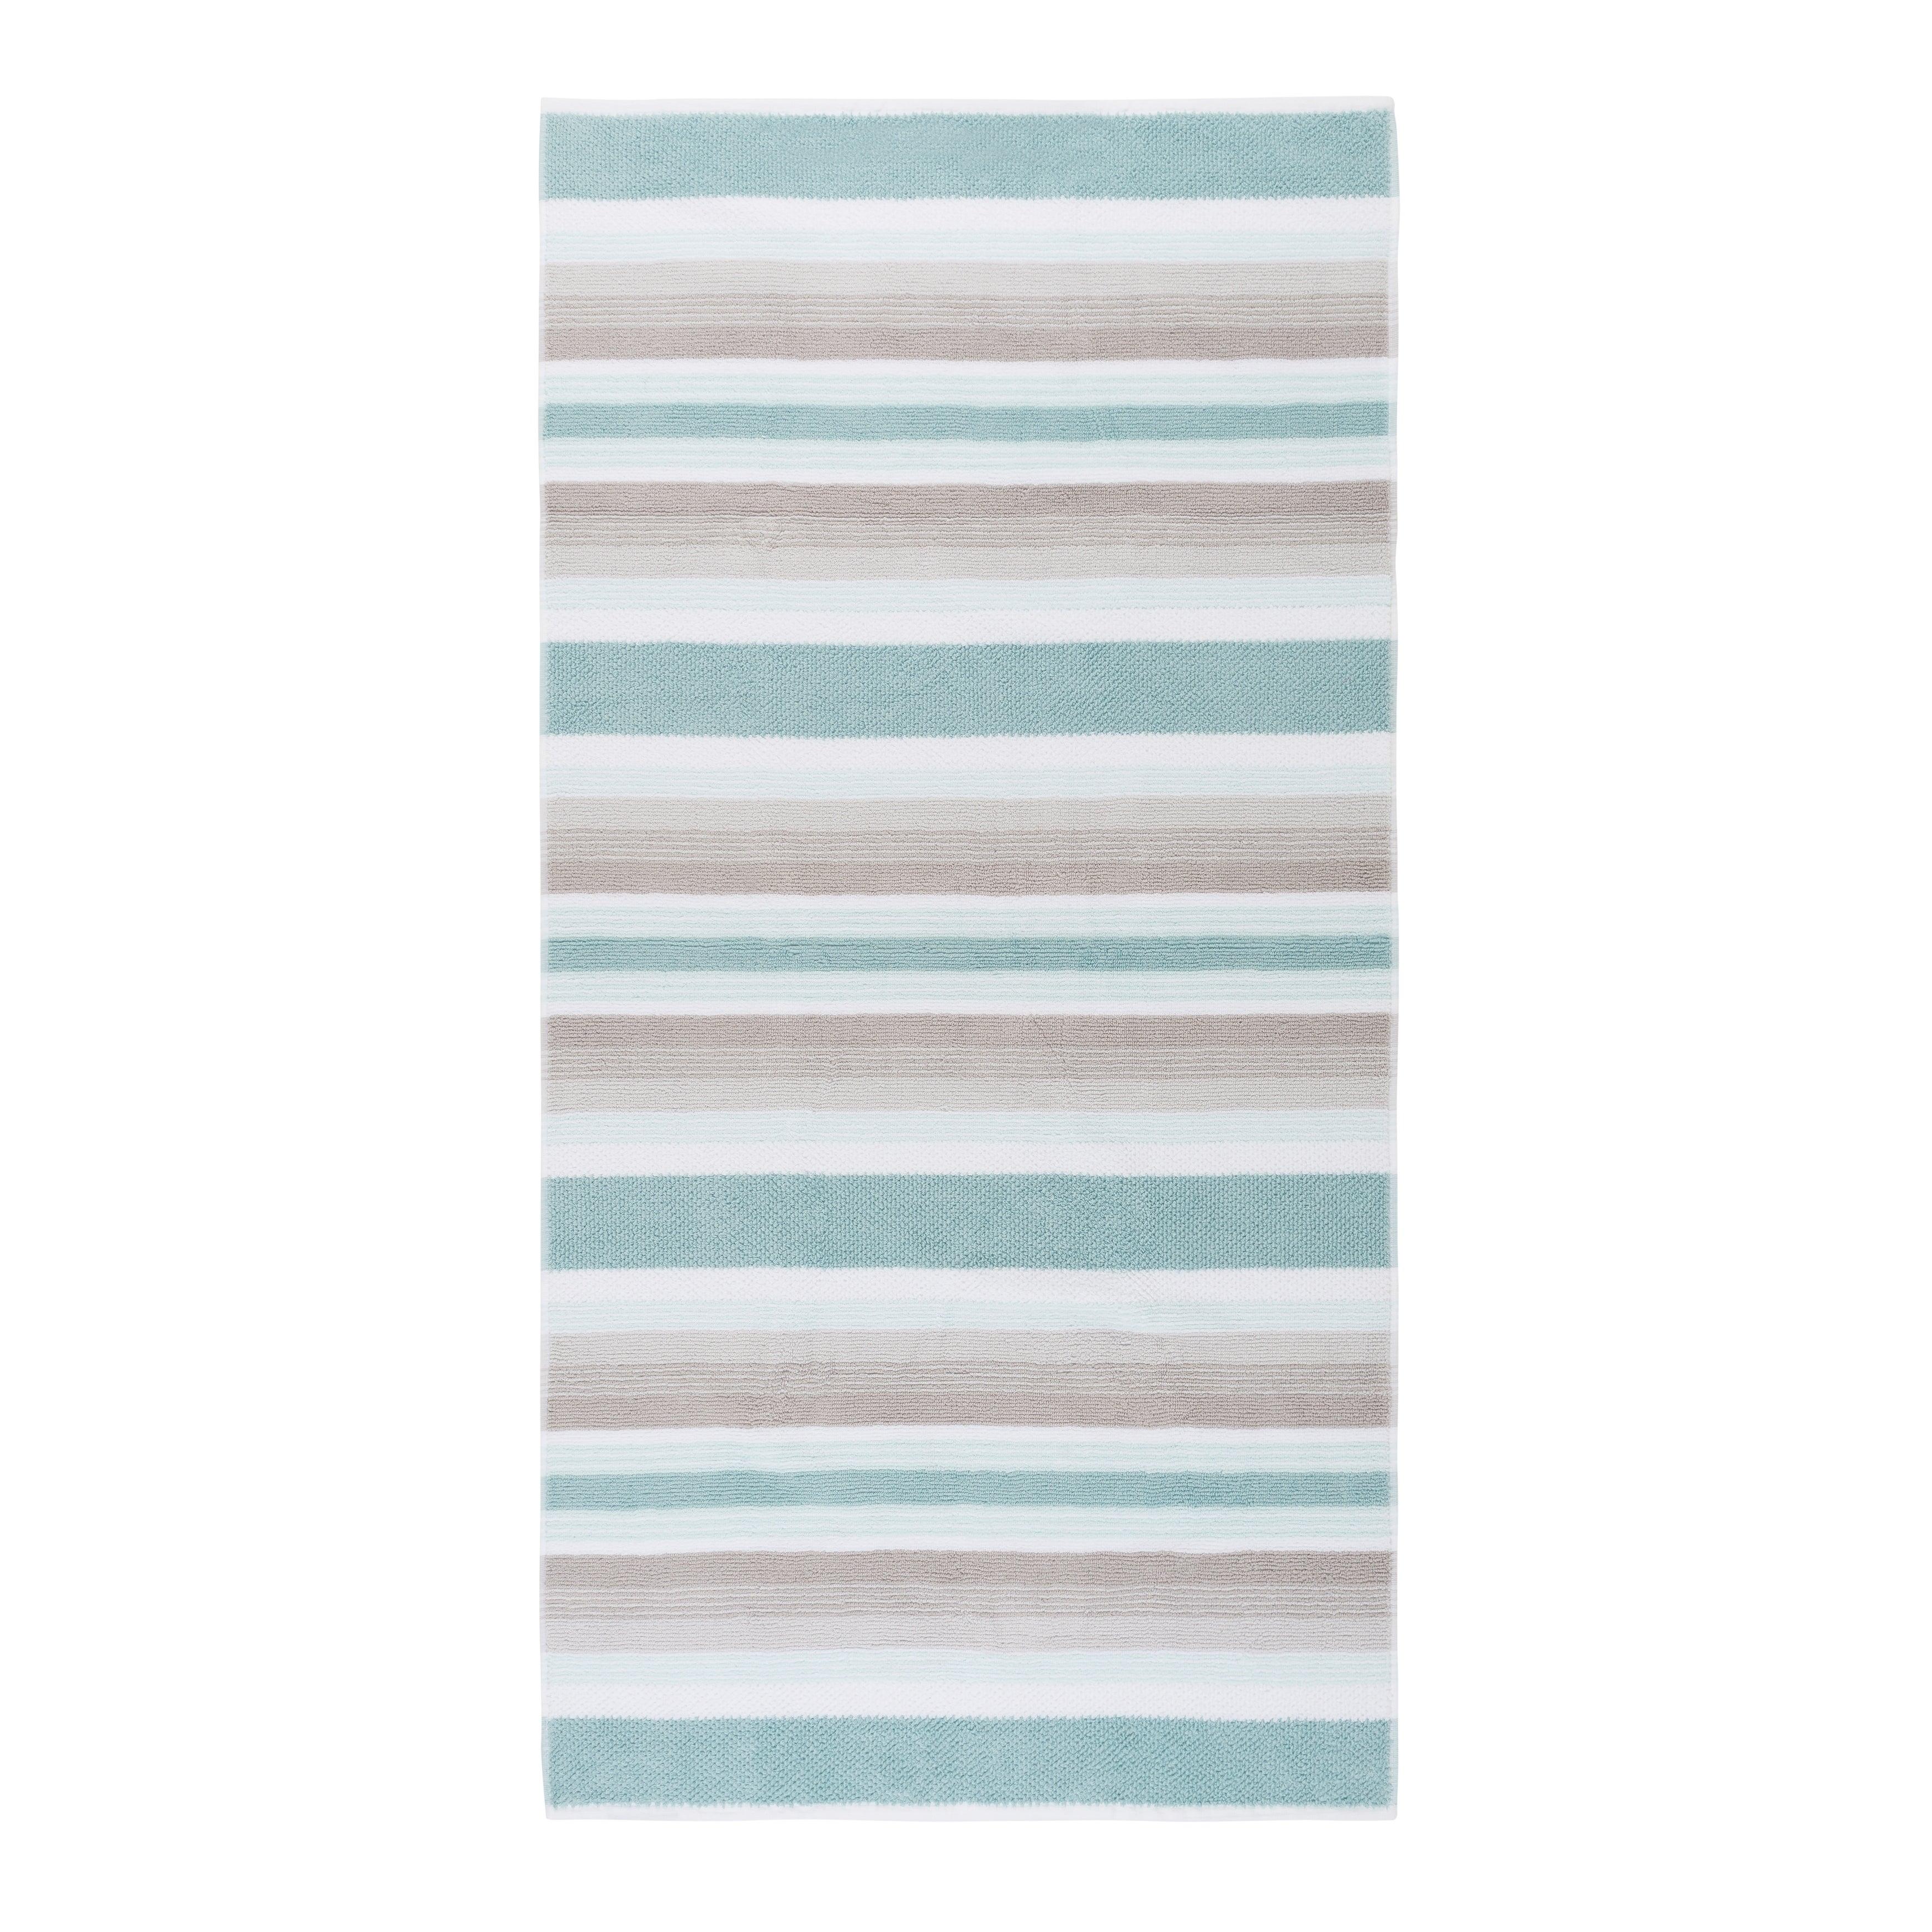 Better At The Beach Hand Towel Set 2 Pc Set Azure blue//white Coastal Home 2-pc